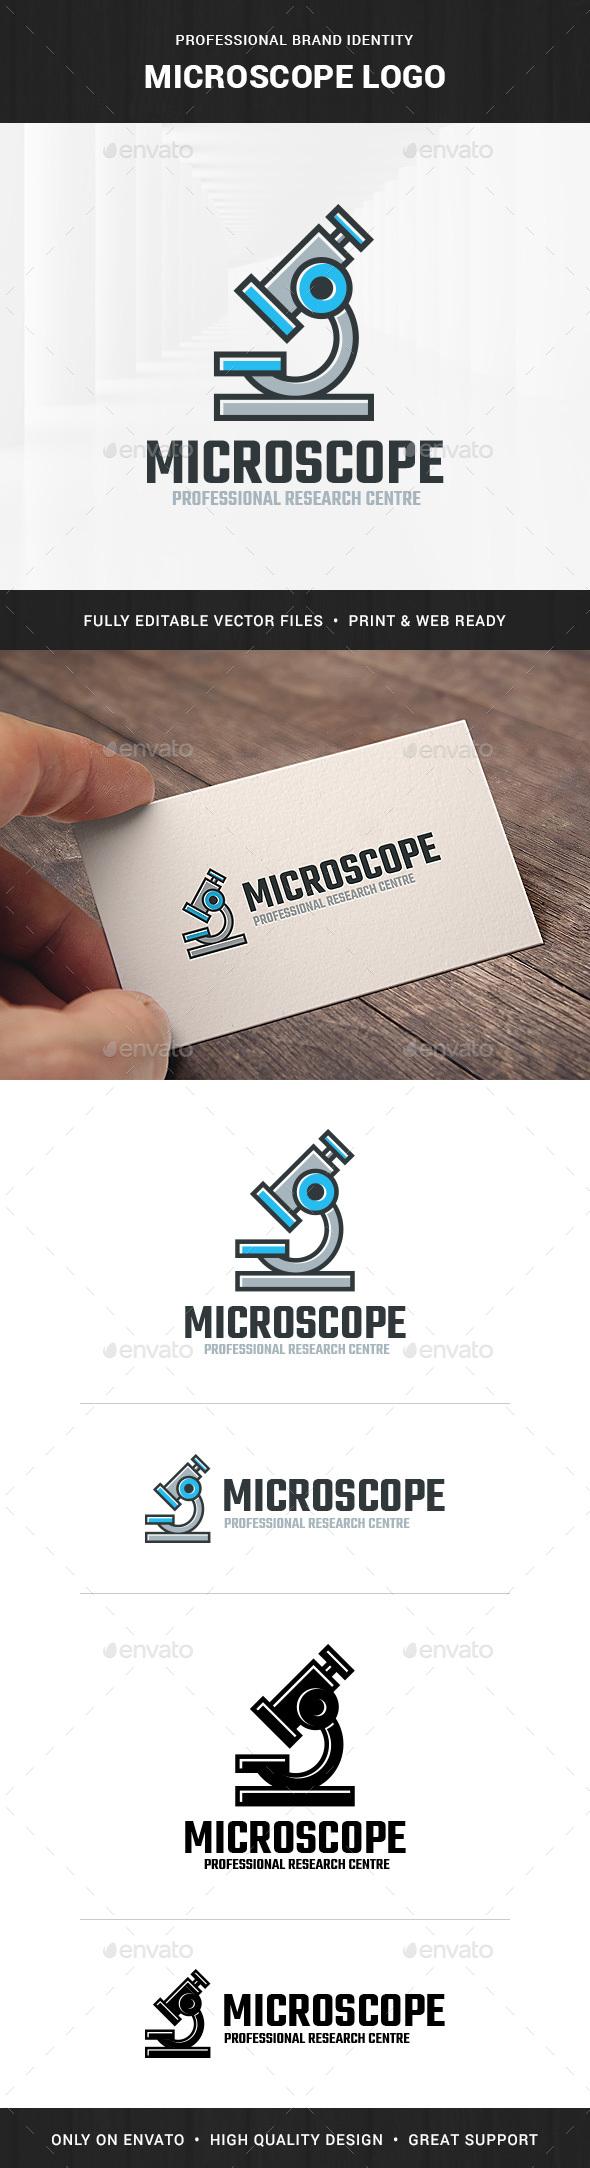 Microscope Logo Template - Objects Logo Templates